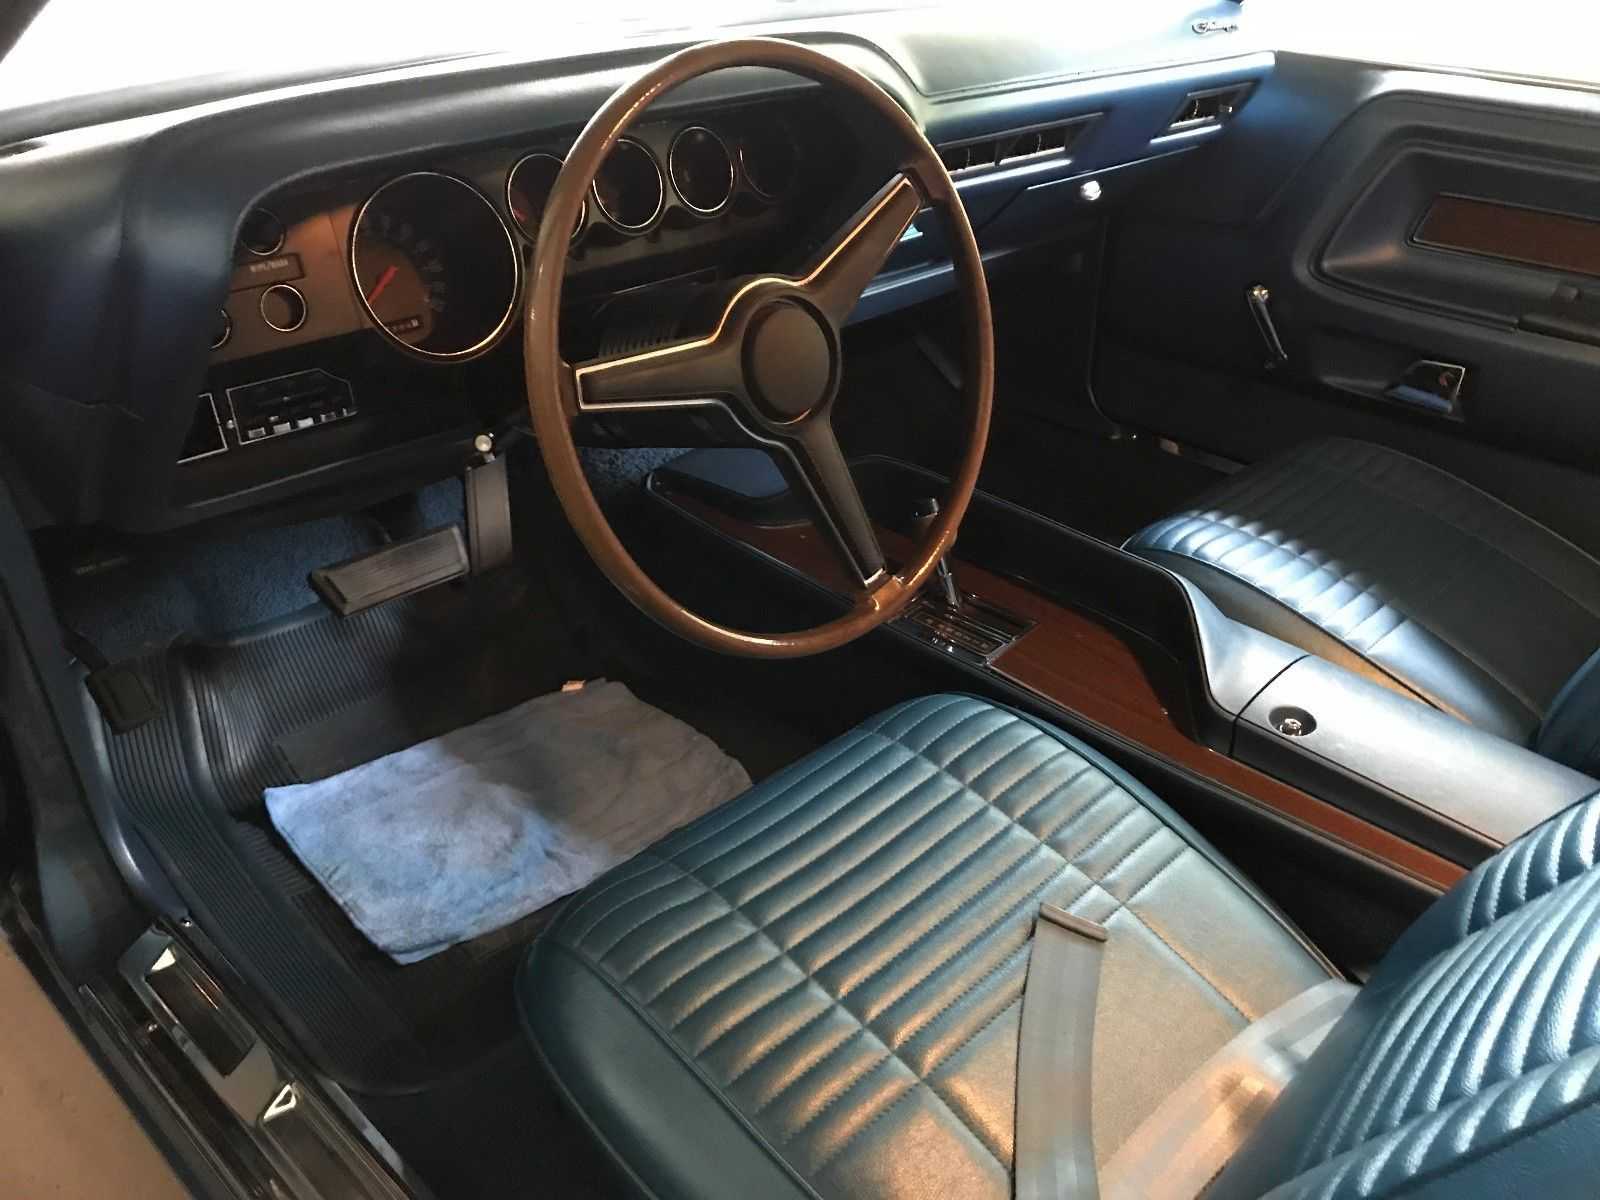 1970 Dodge Challenger drivers seat